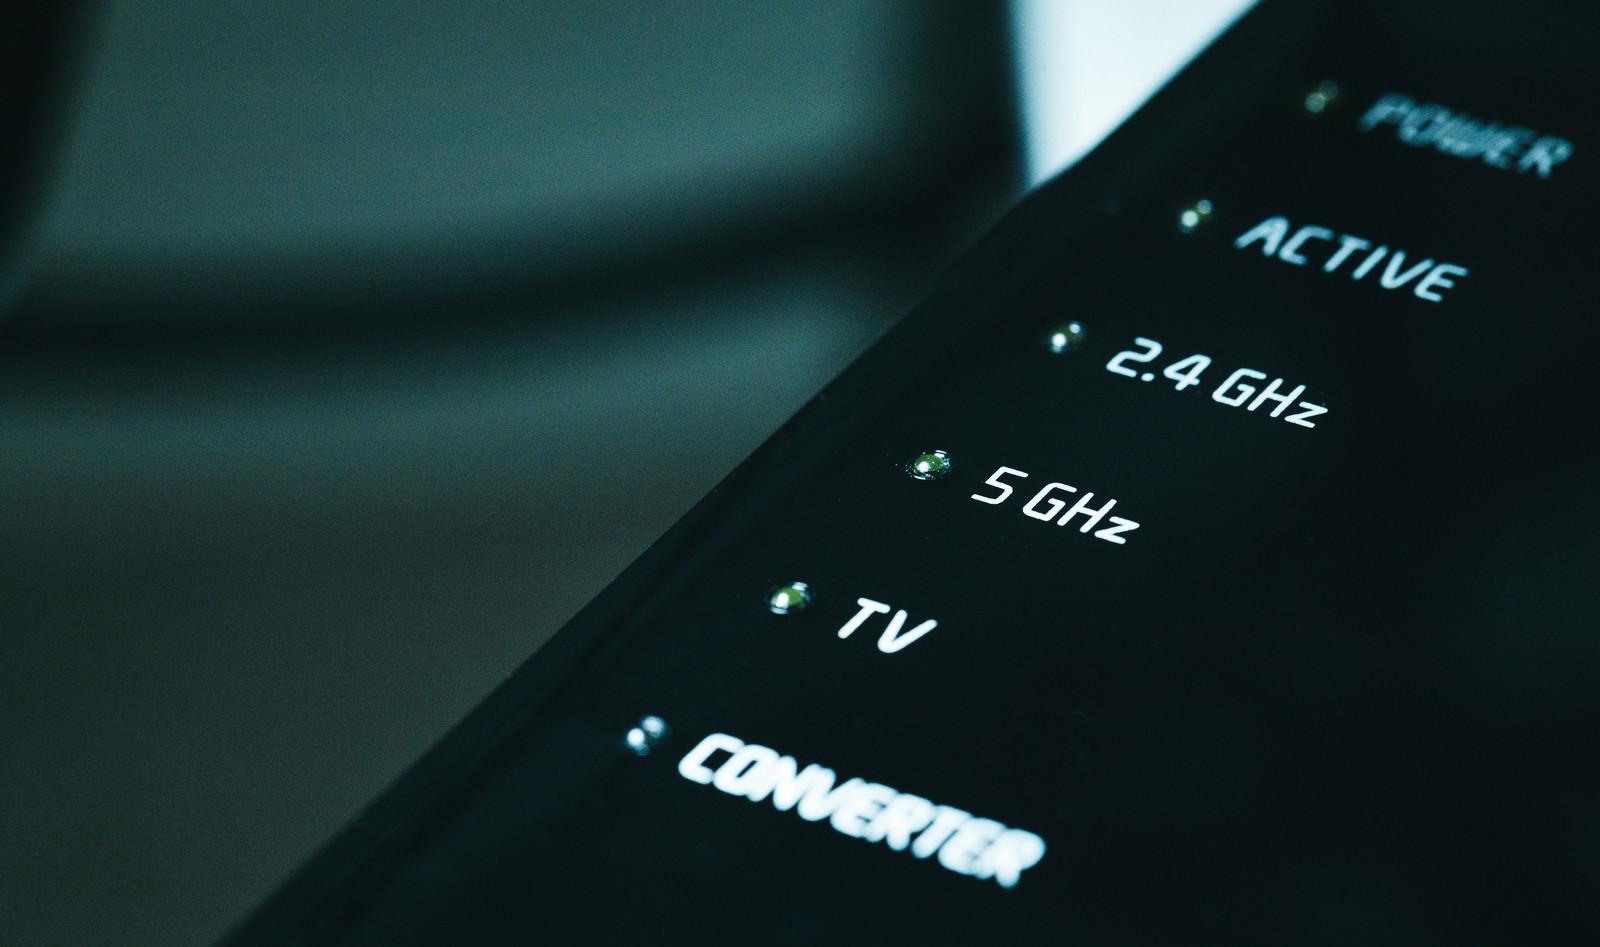 「5GHz帯が使える無線ルータ」の写真